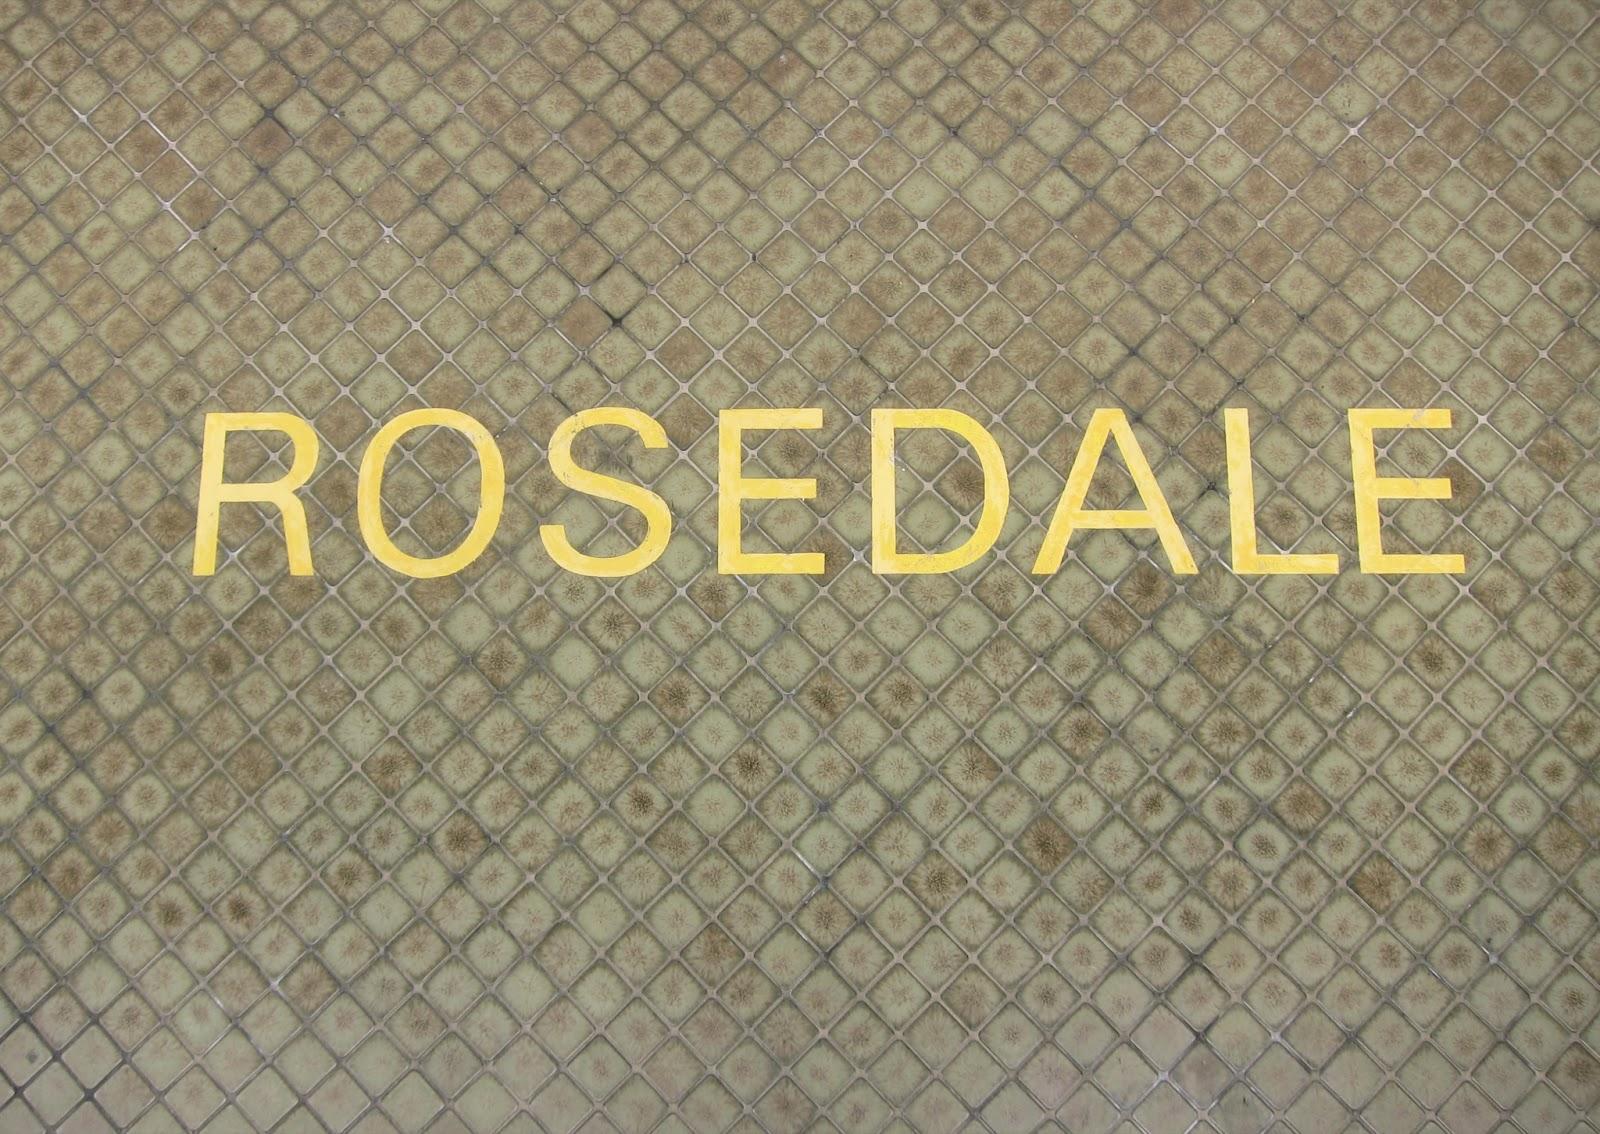 Rosedale station identification tiling